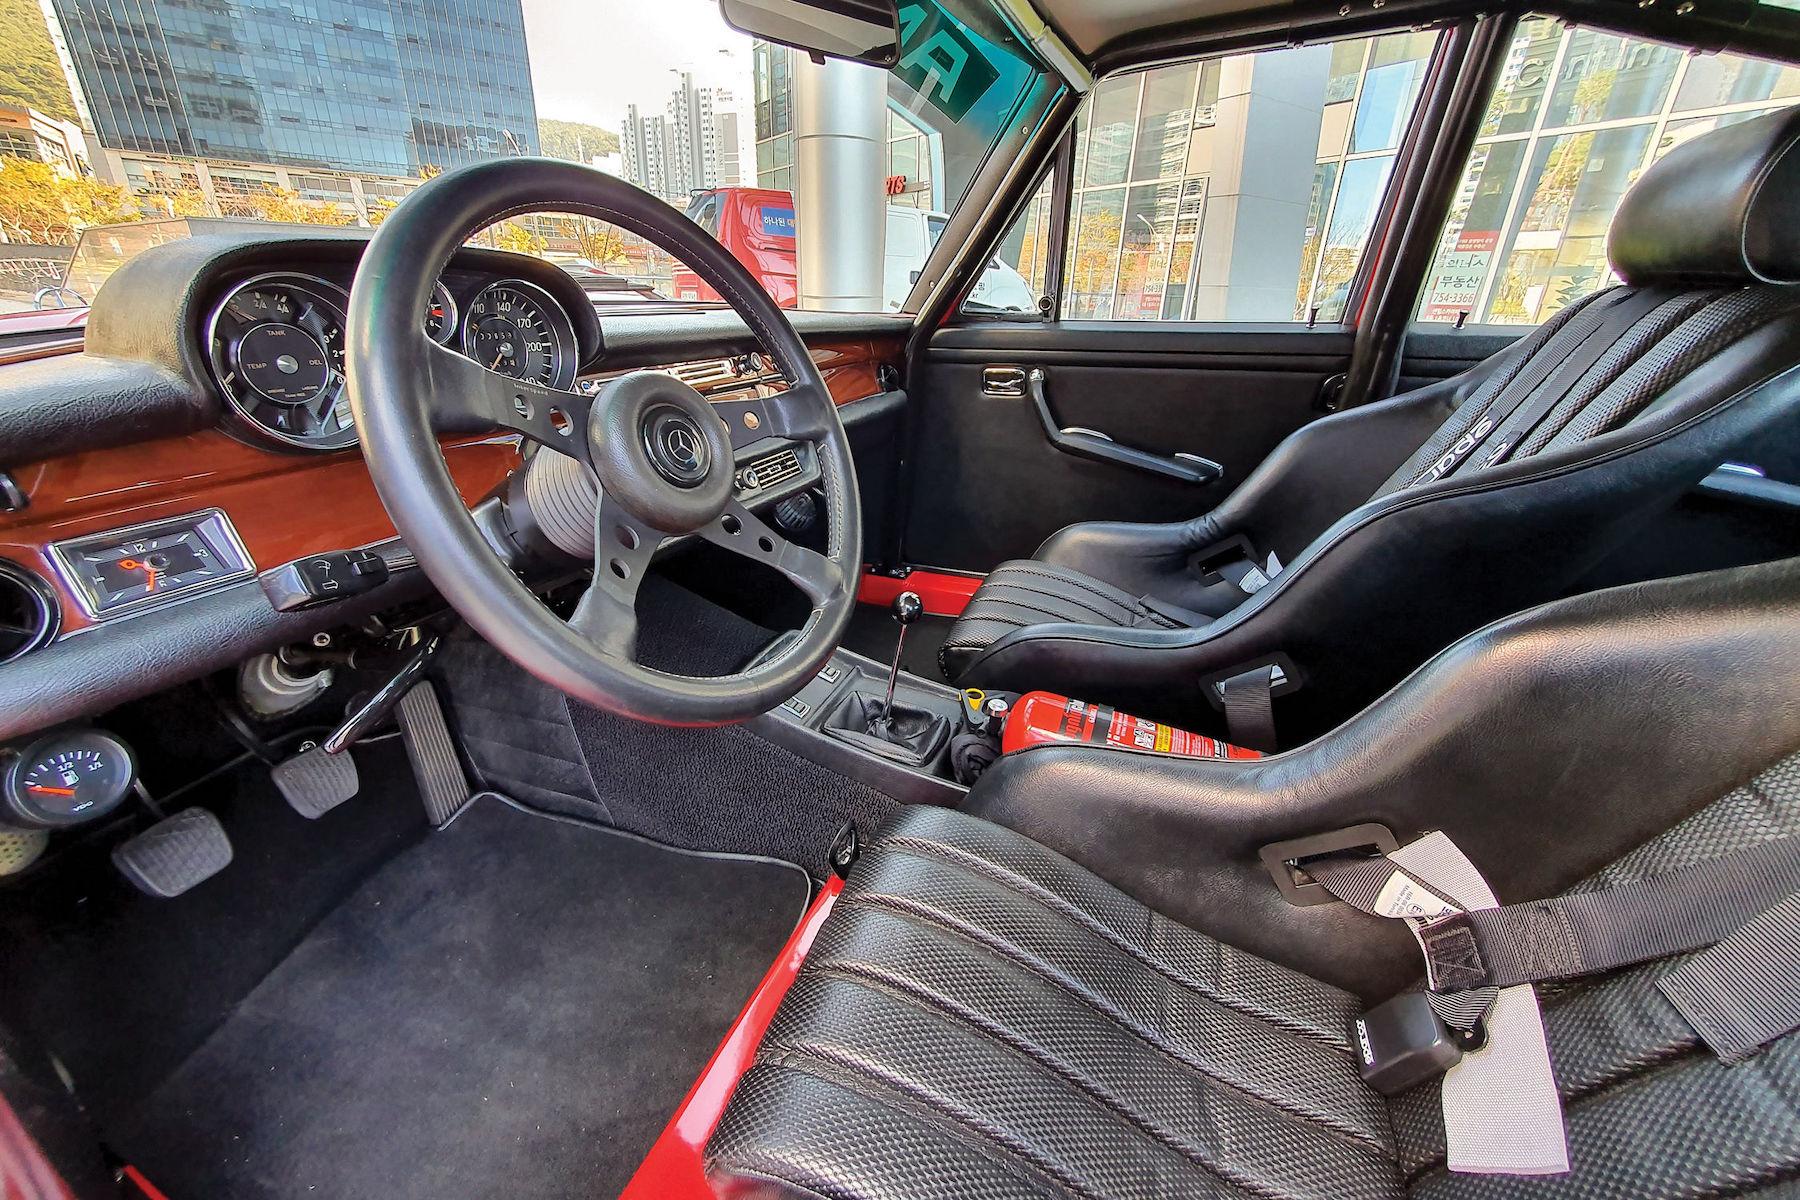 Petrolhead Corner - Mercedes 300 SEL 6.8 AMG red pig - 6